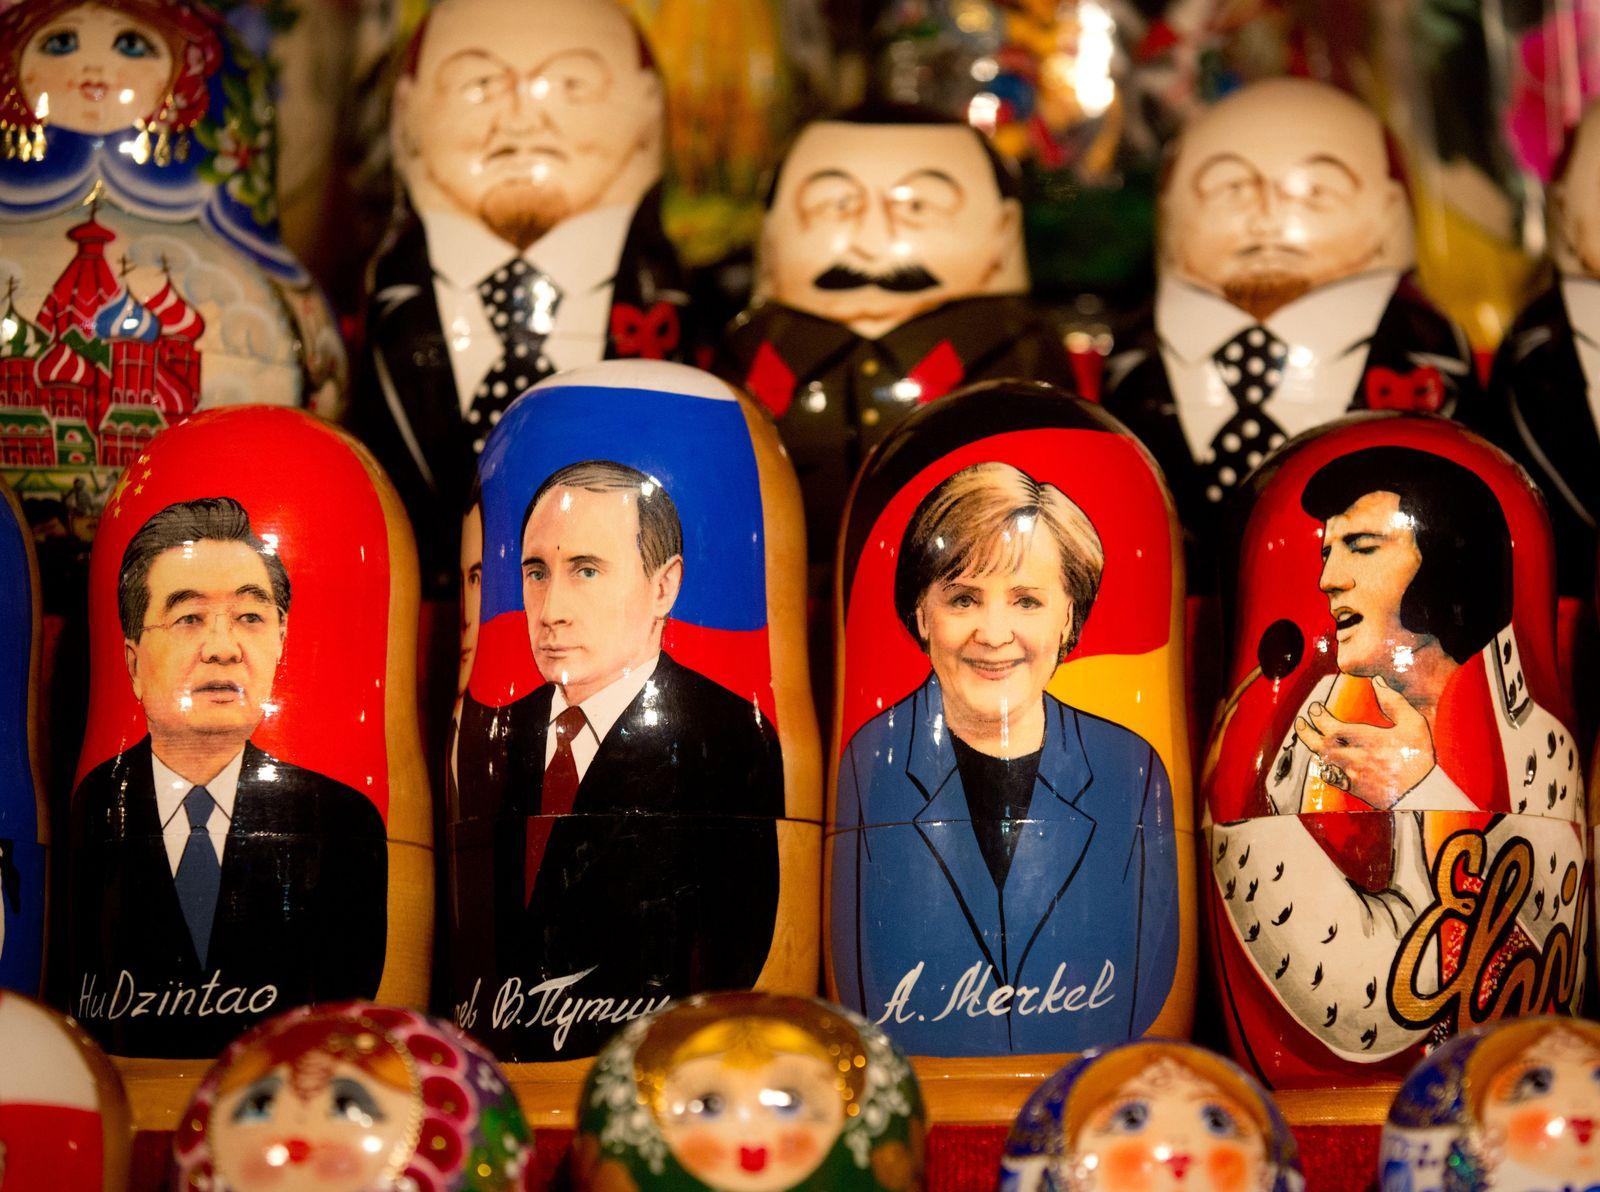 Merkel und Putin als Matrjoschkas